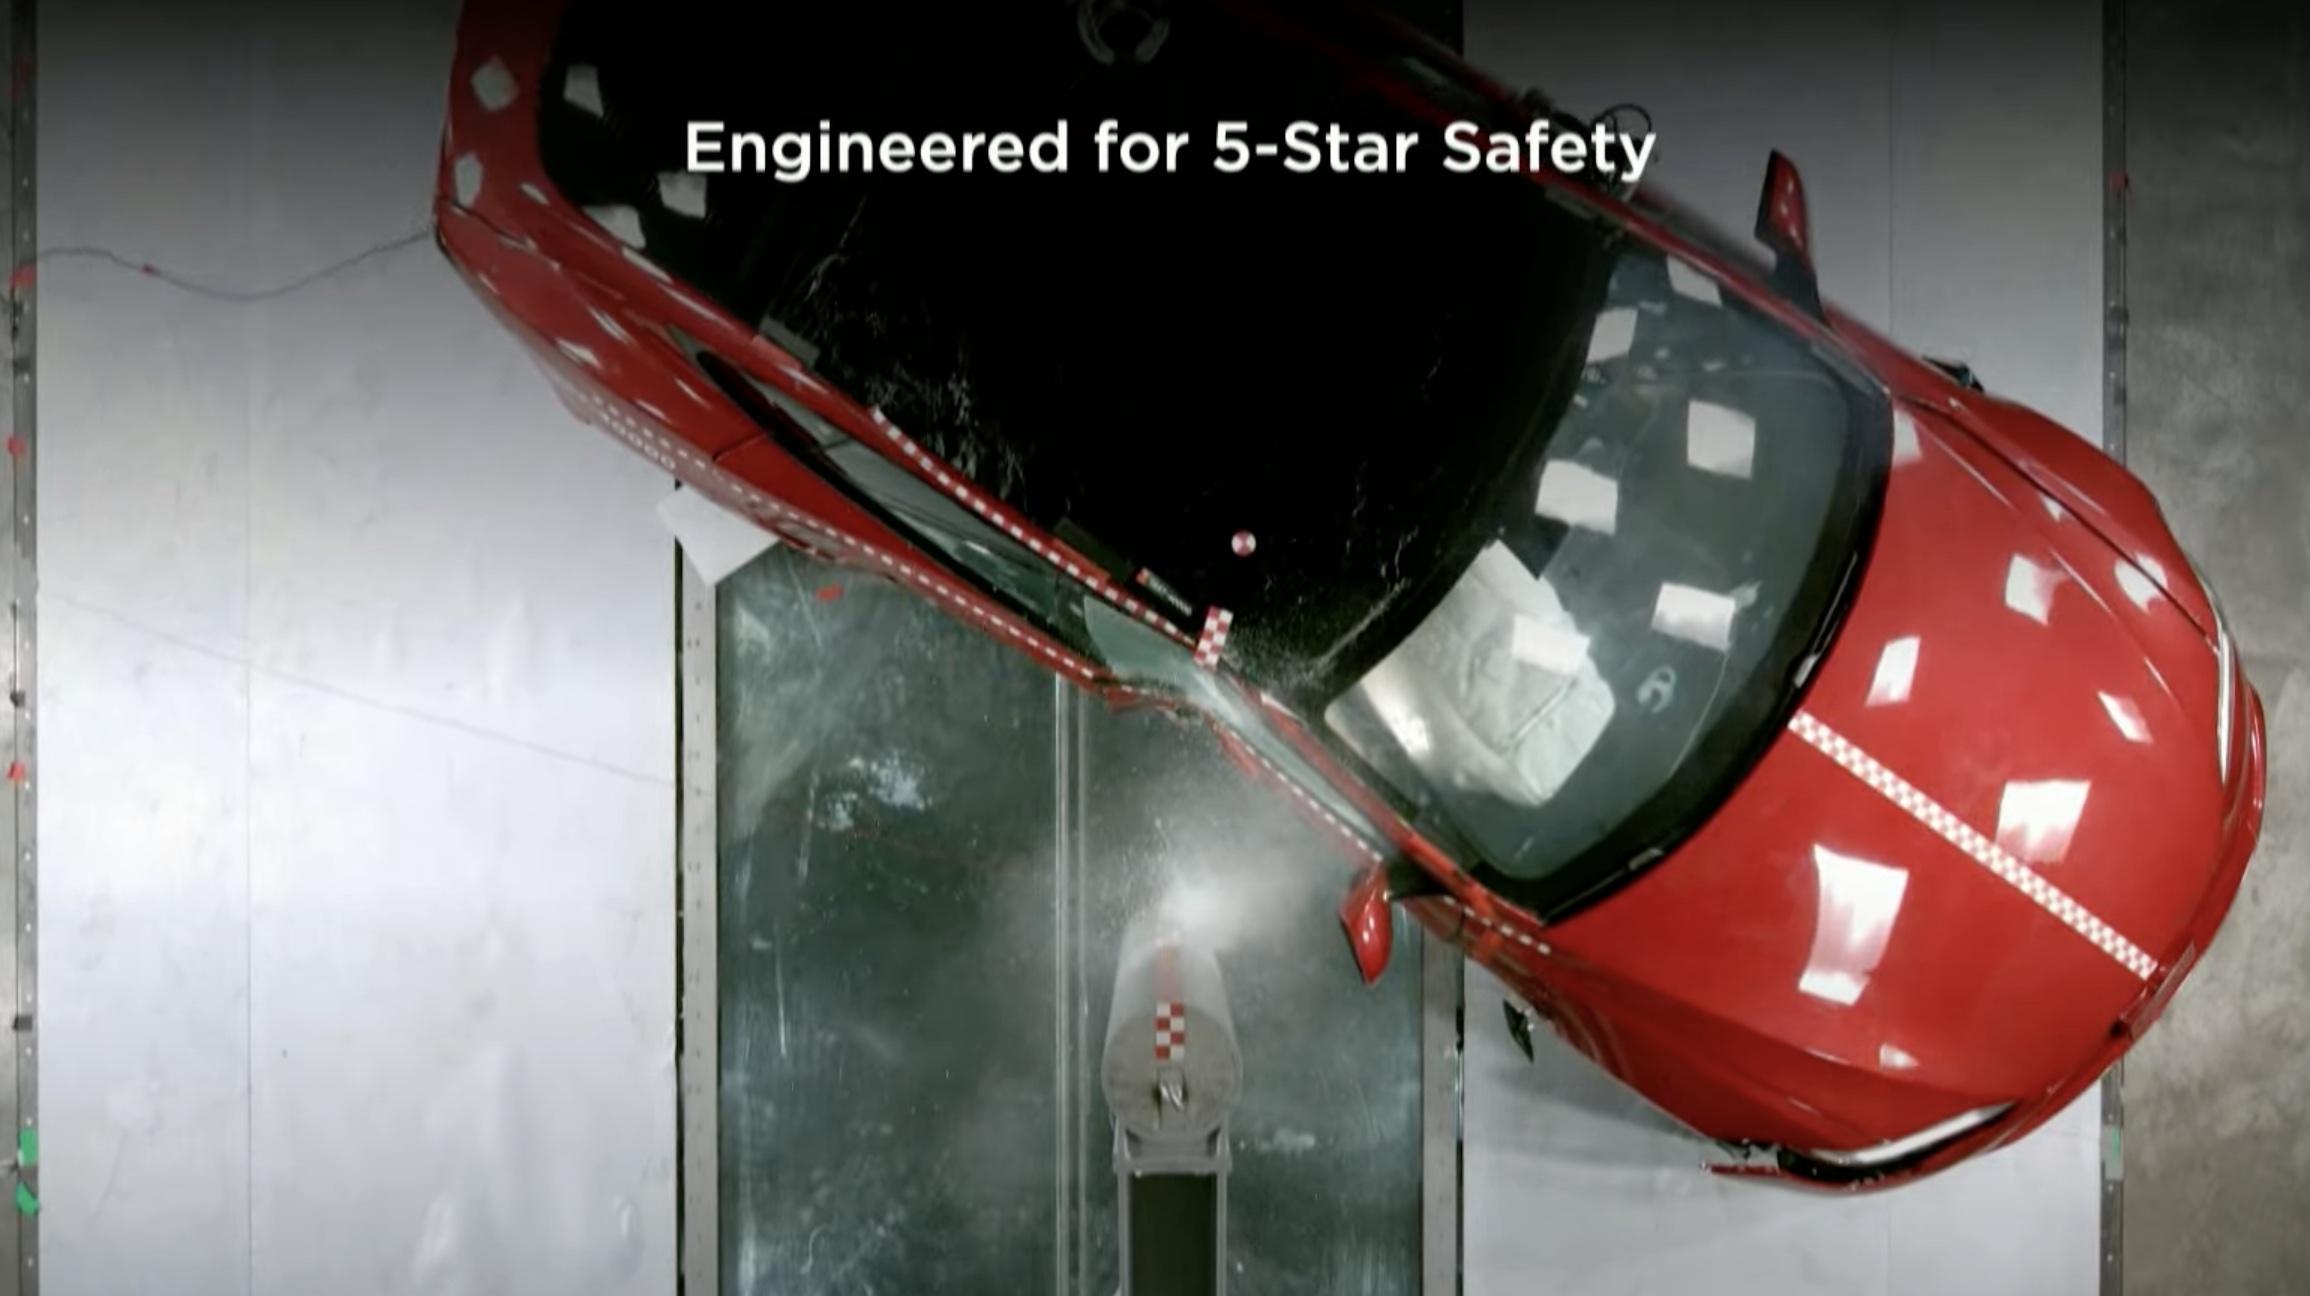 Tesla-model-s-5-star-safety